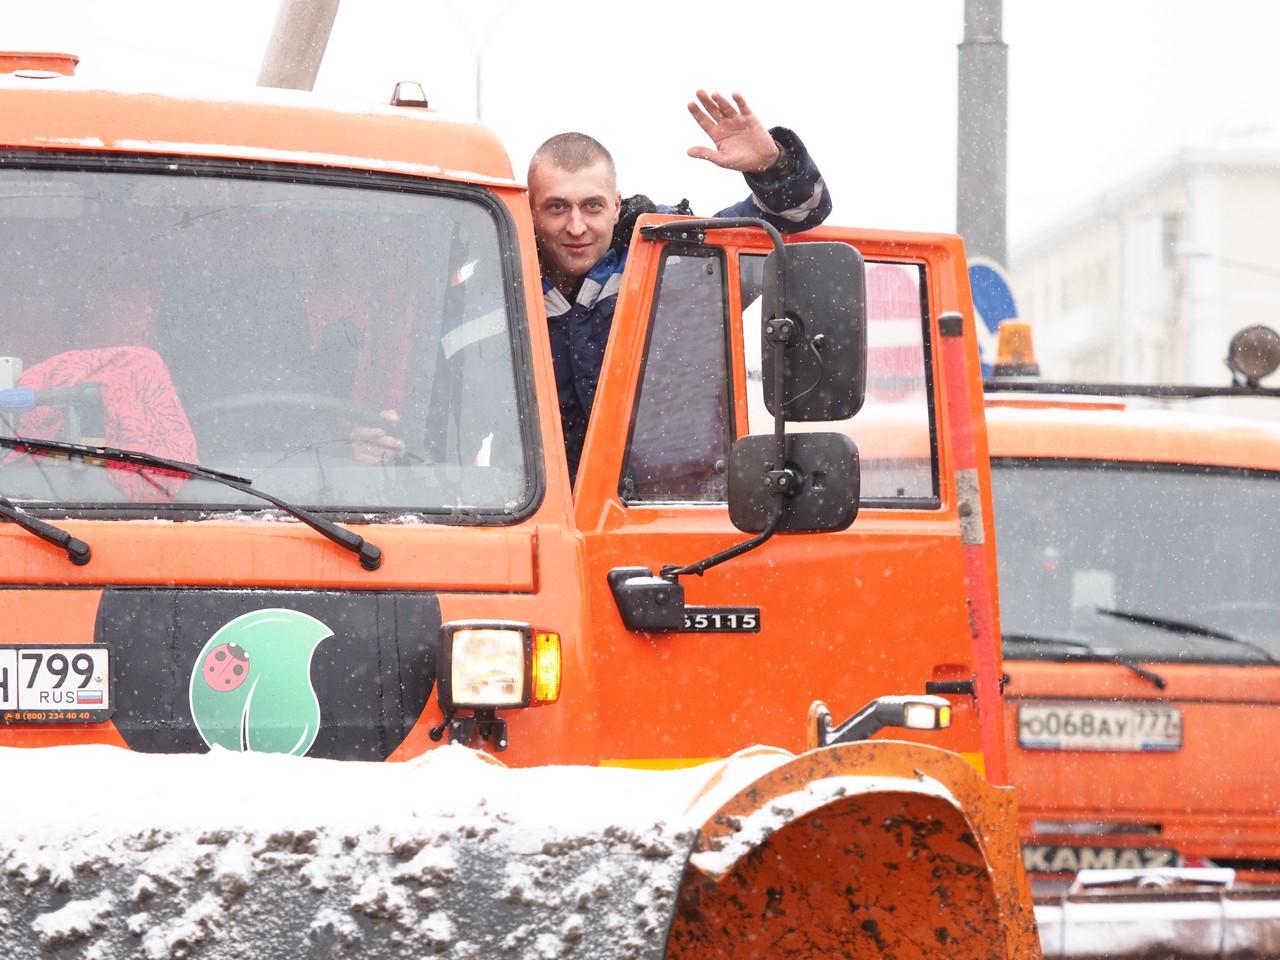 Свыше 10 единиц техники устраняют последствия снегопада в Москве